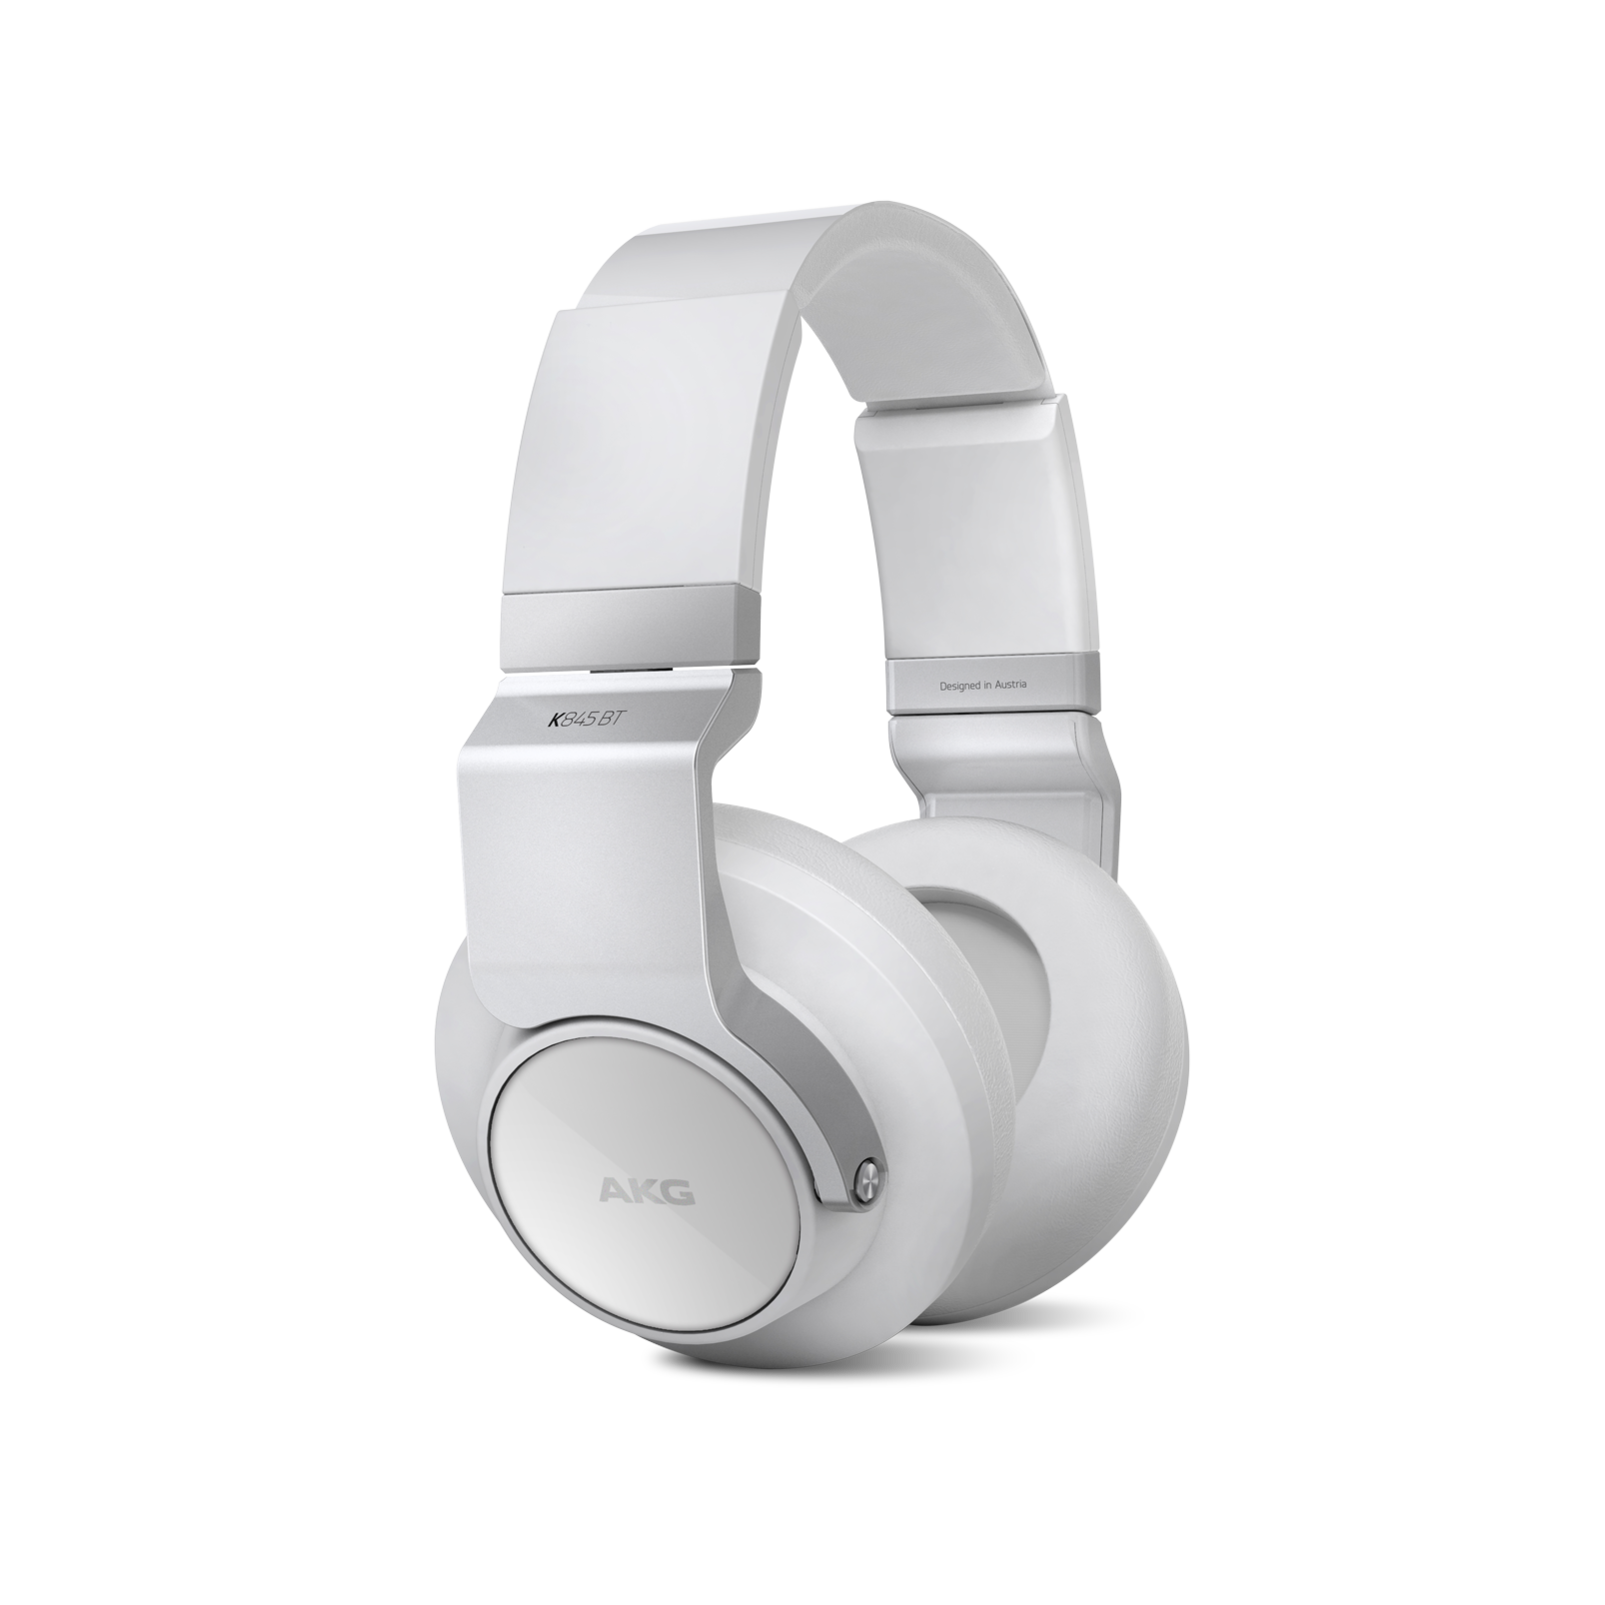 K 845BT - White - High performance over-ear wireless headphones with Bluetooth - Hero